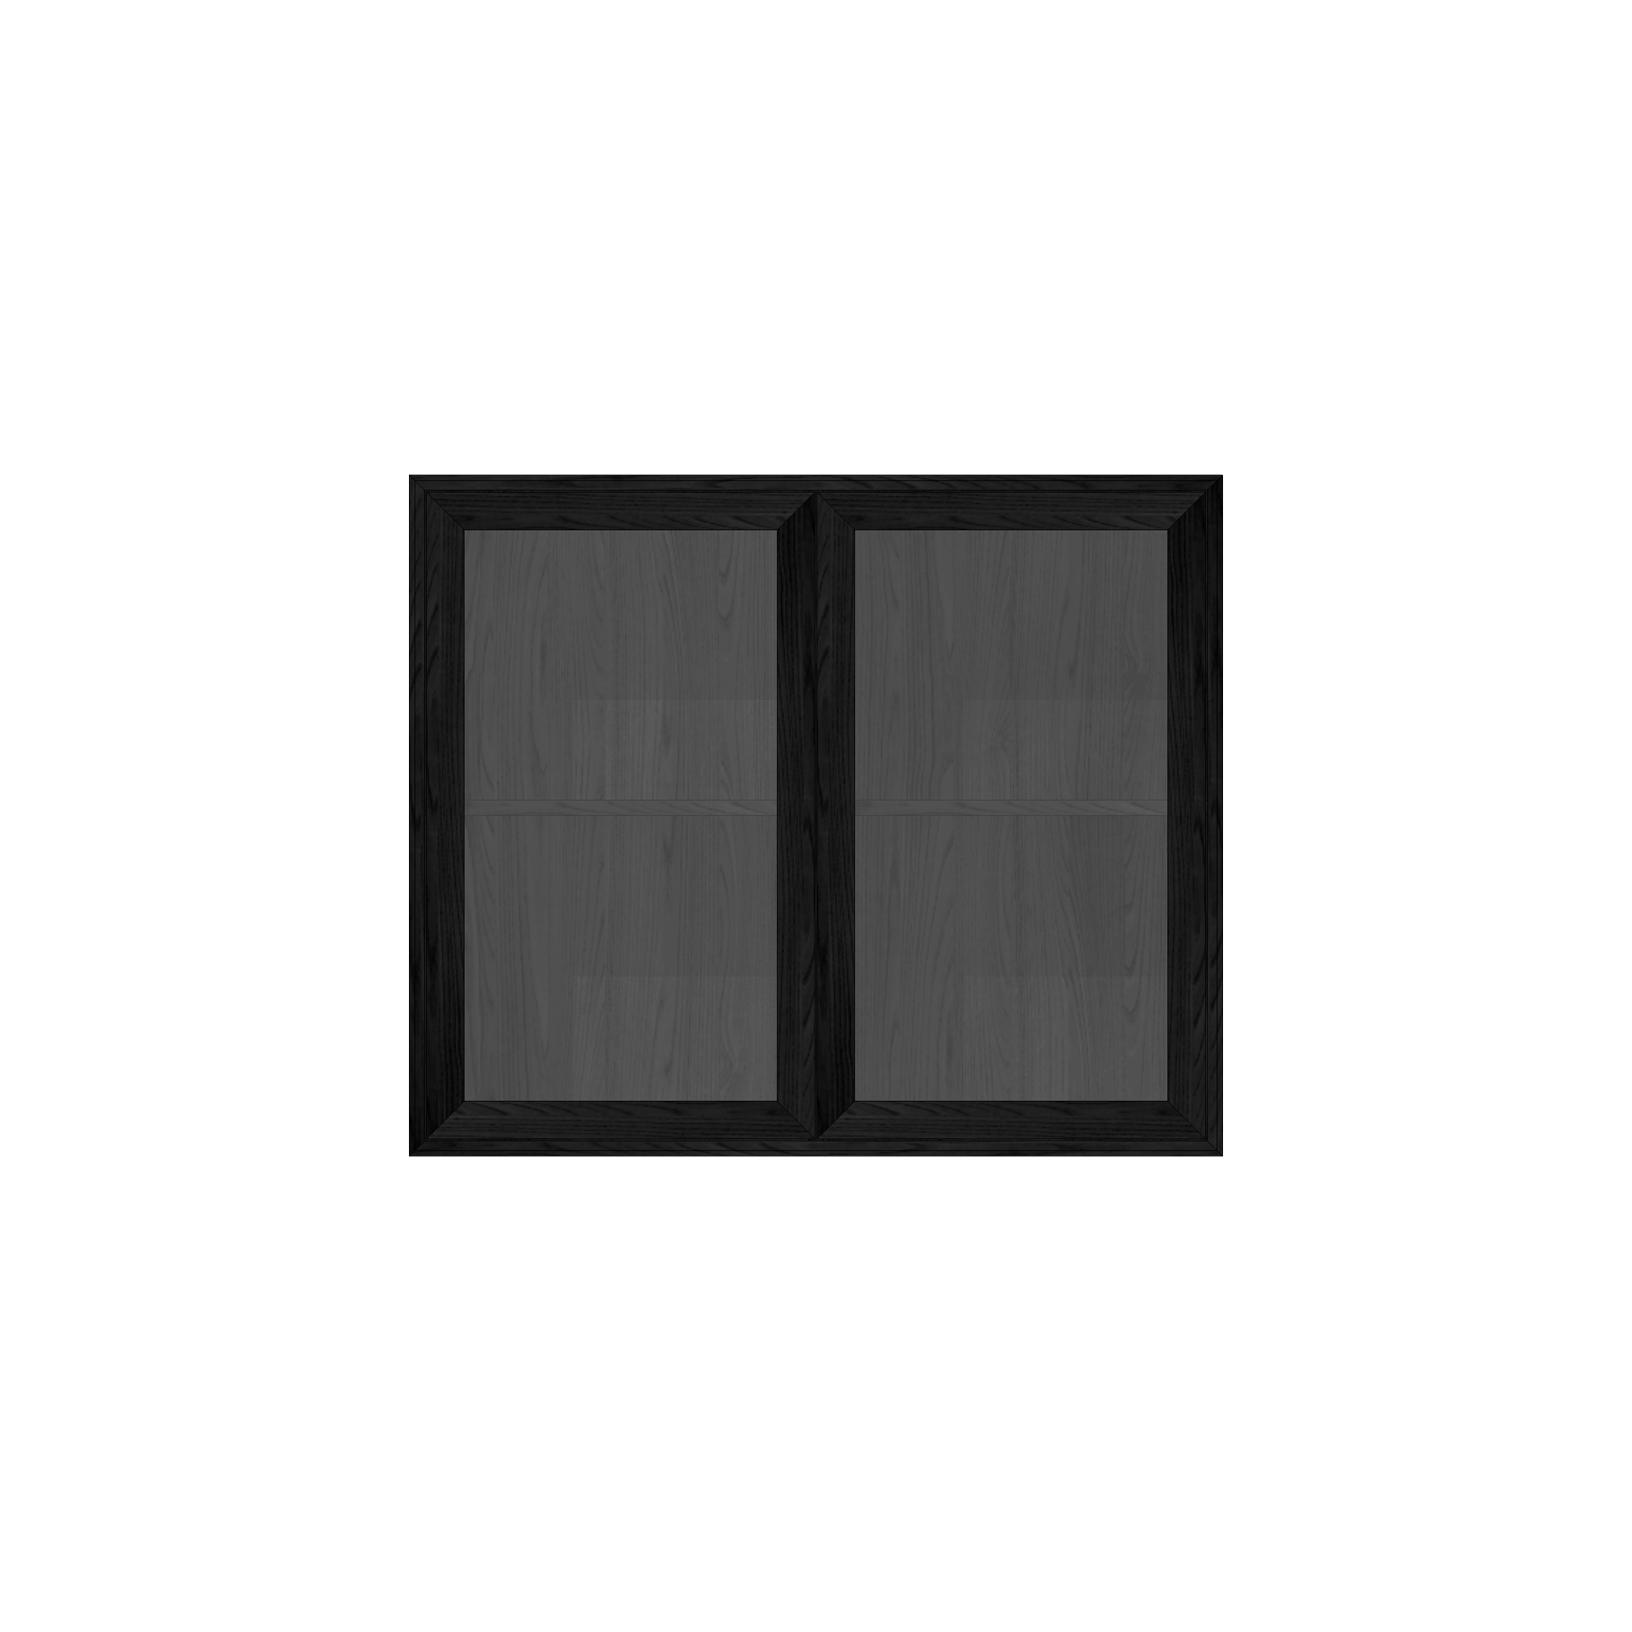 EDGE 2-SEKTION 2 vitrindörrar